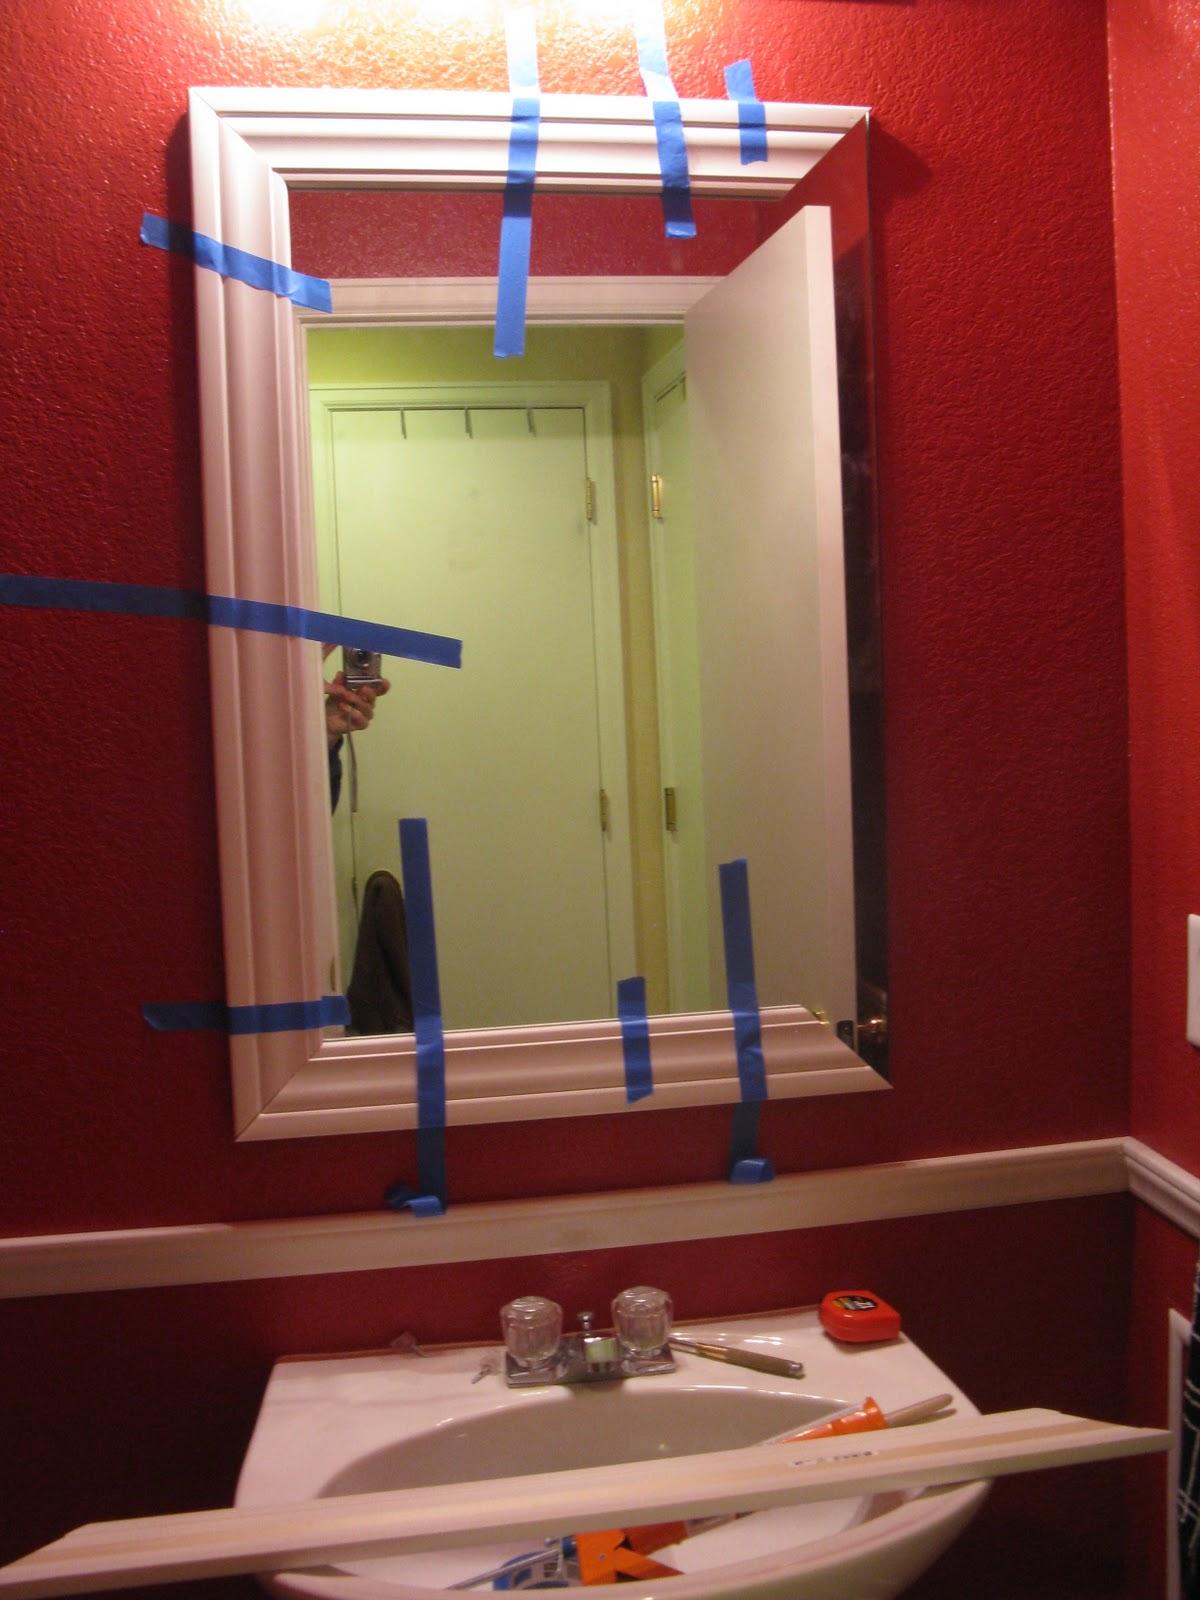 DIY My Bathroom Redo Inspiration For Moms - How to redo my bathroom